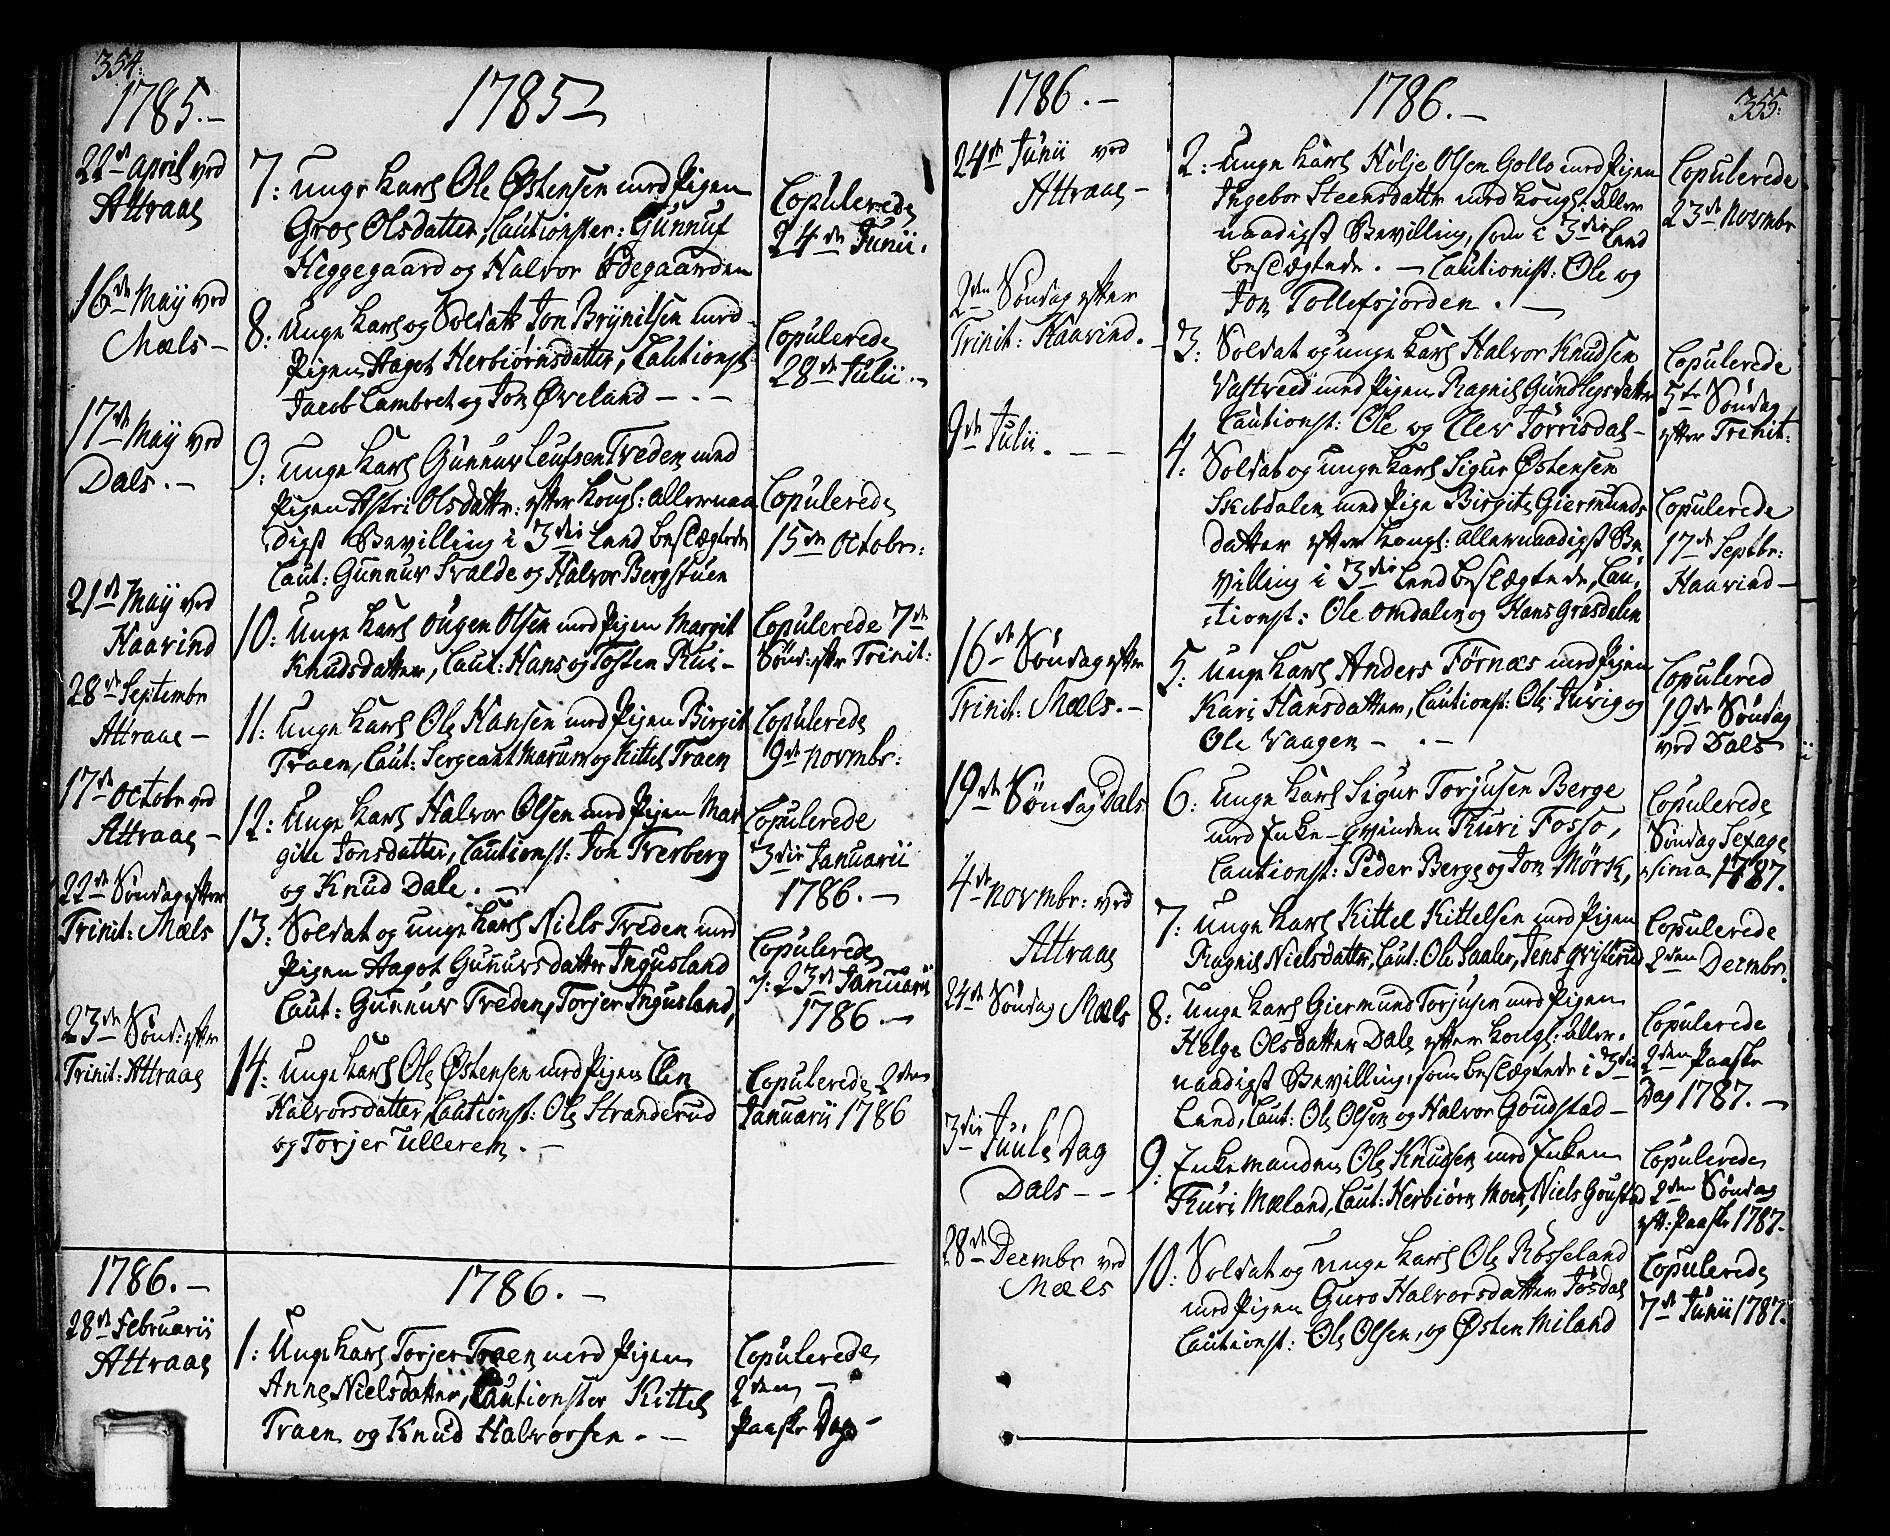 SAKO, Tinn kirkebøker, F/Fa/L0002: Ministerialbok nr. I 2, 1757-1810, s. 354-355